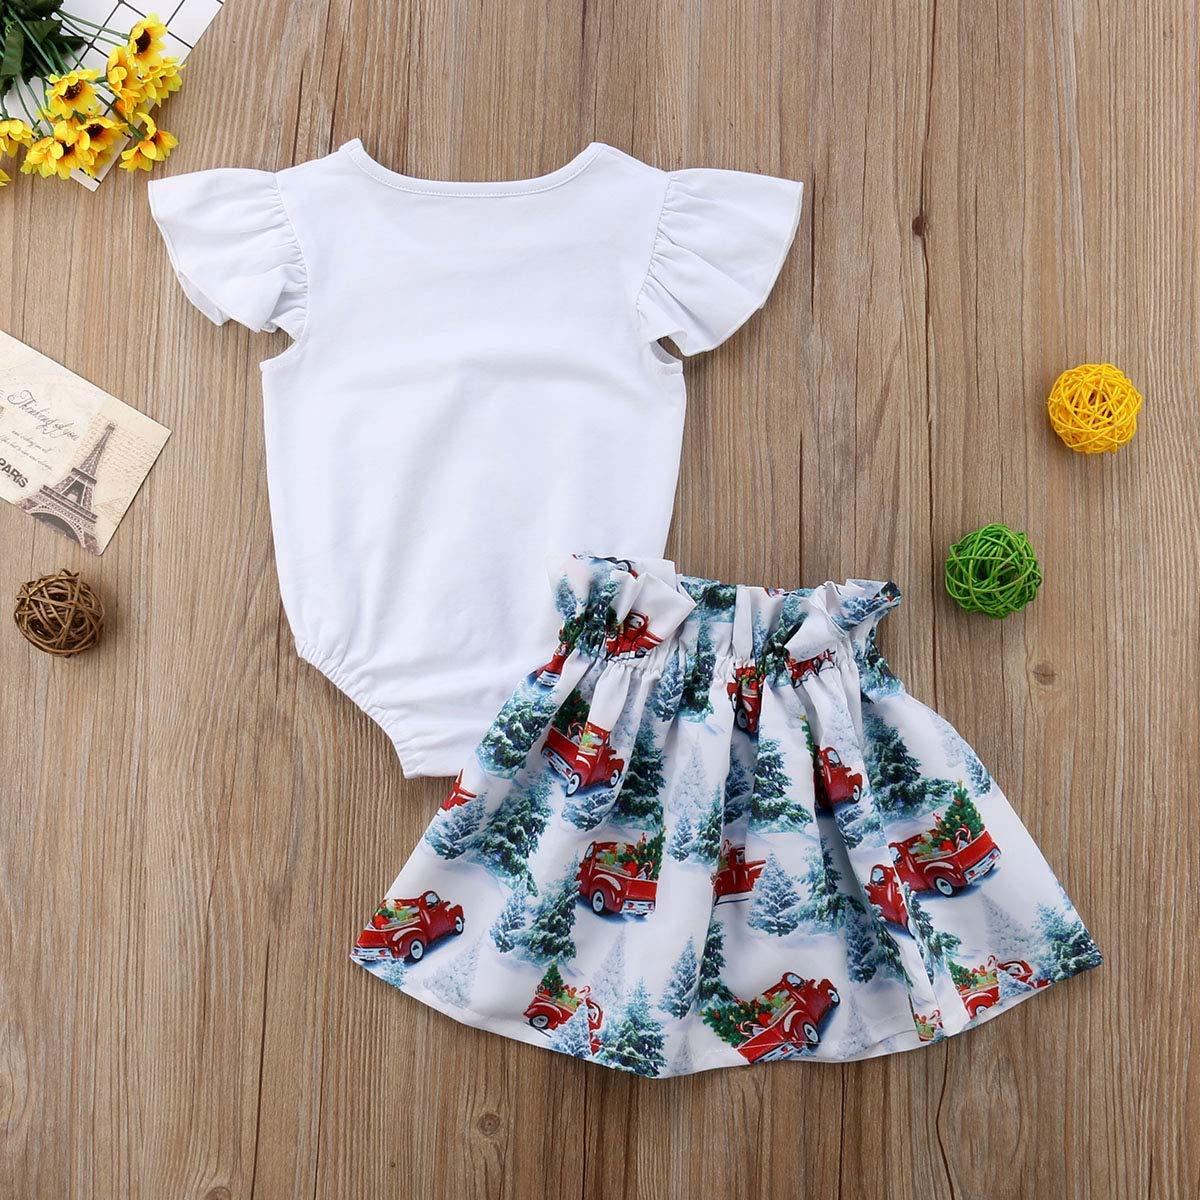 GoodFilling Infant Toddler Baby Girls Ruffle Sleeve Romper with Christmas Skirt